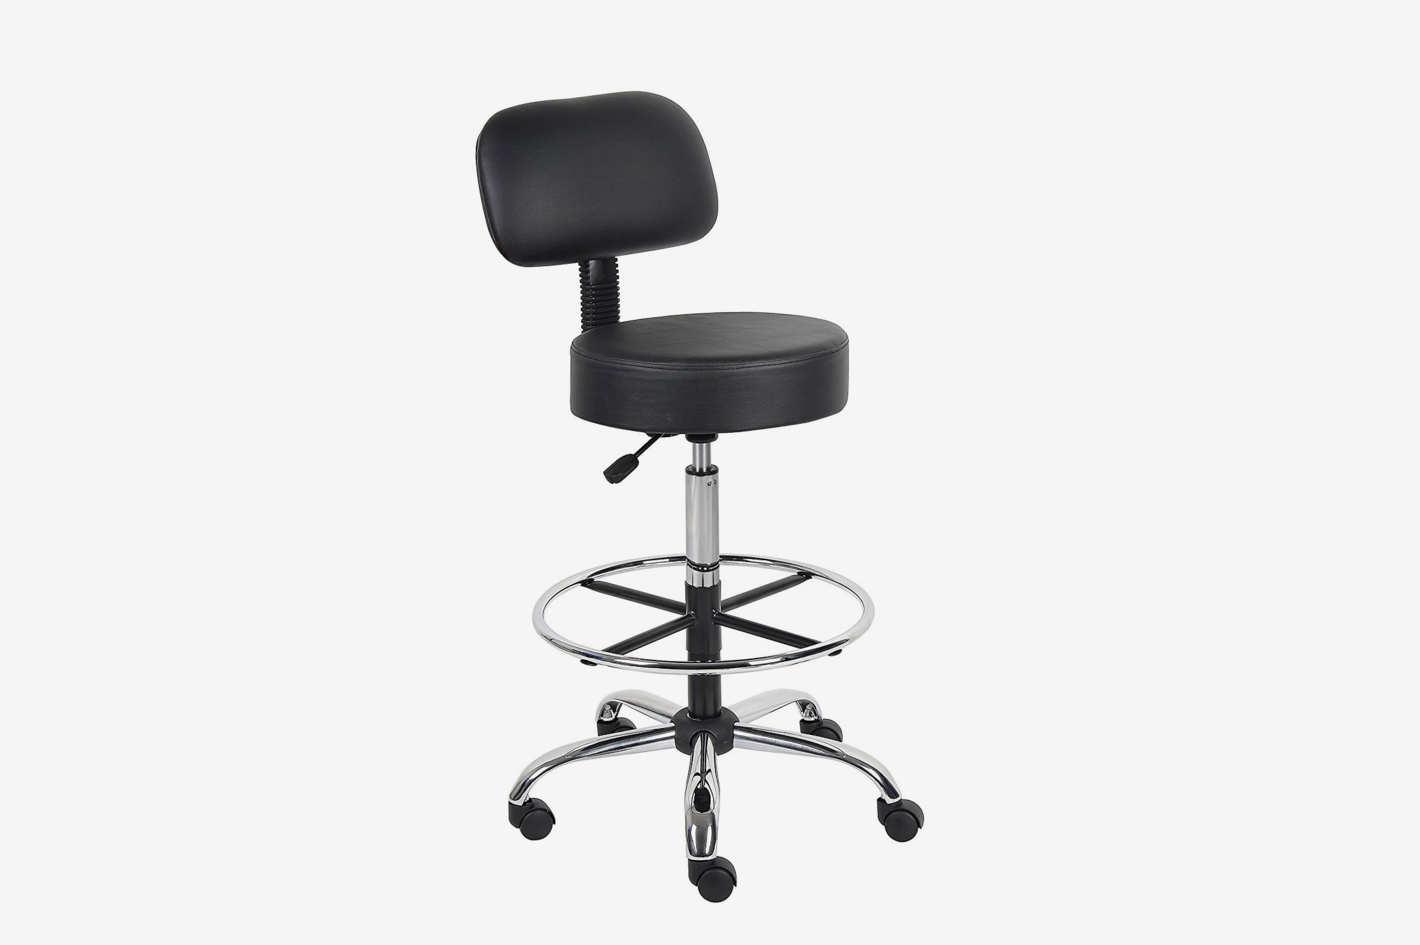 Boss Office drafting chair for standing desk